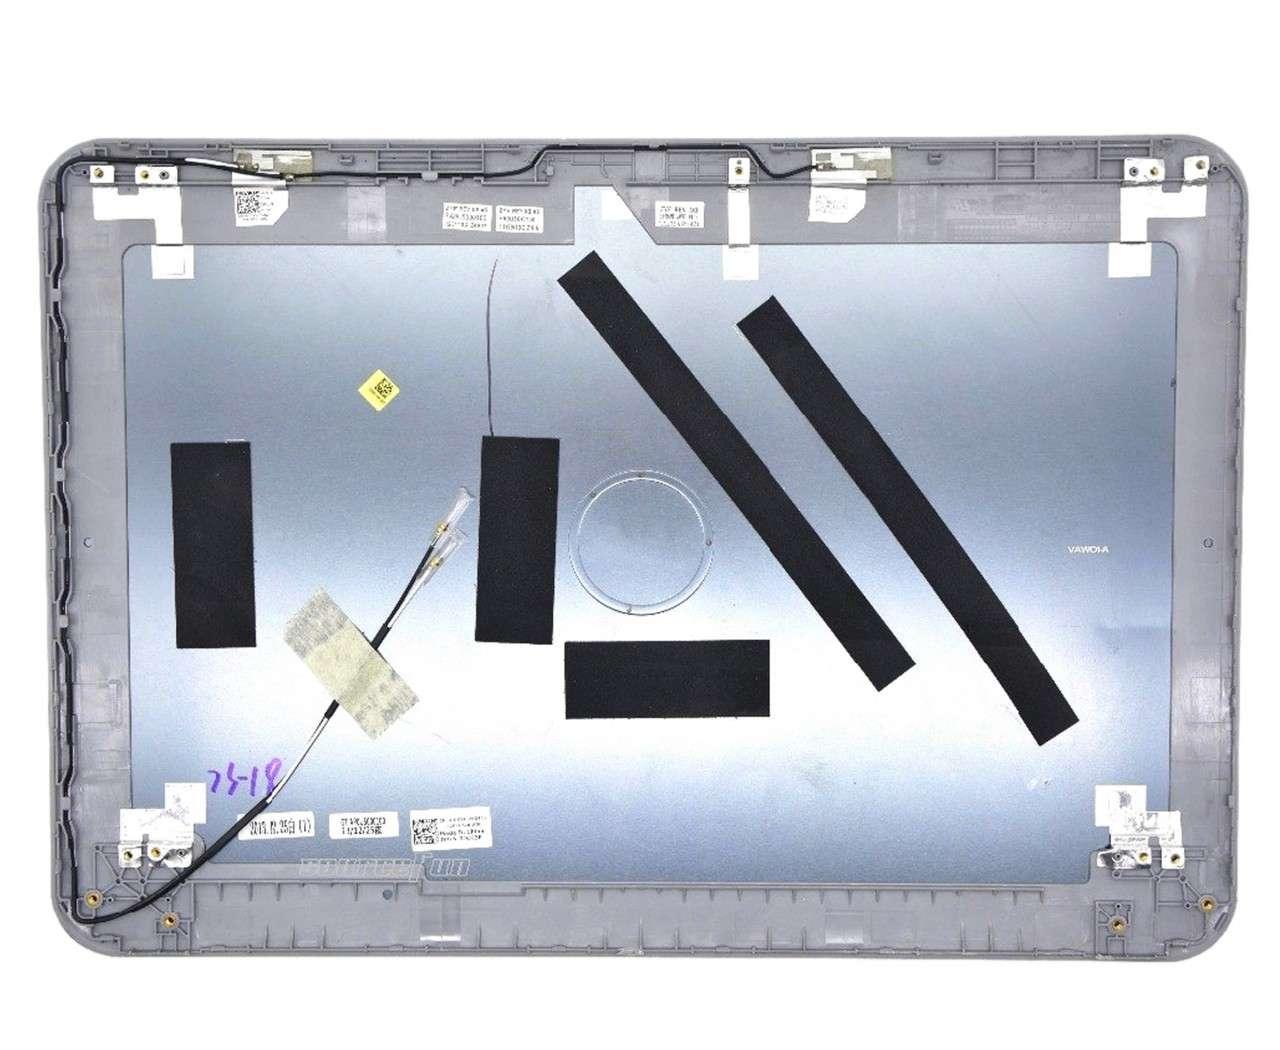 Capac Display BackCover Dell Inspiron 3537 Carcasa Display Gri Metalic imagine powerlaptop.ro 2021